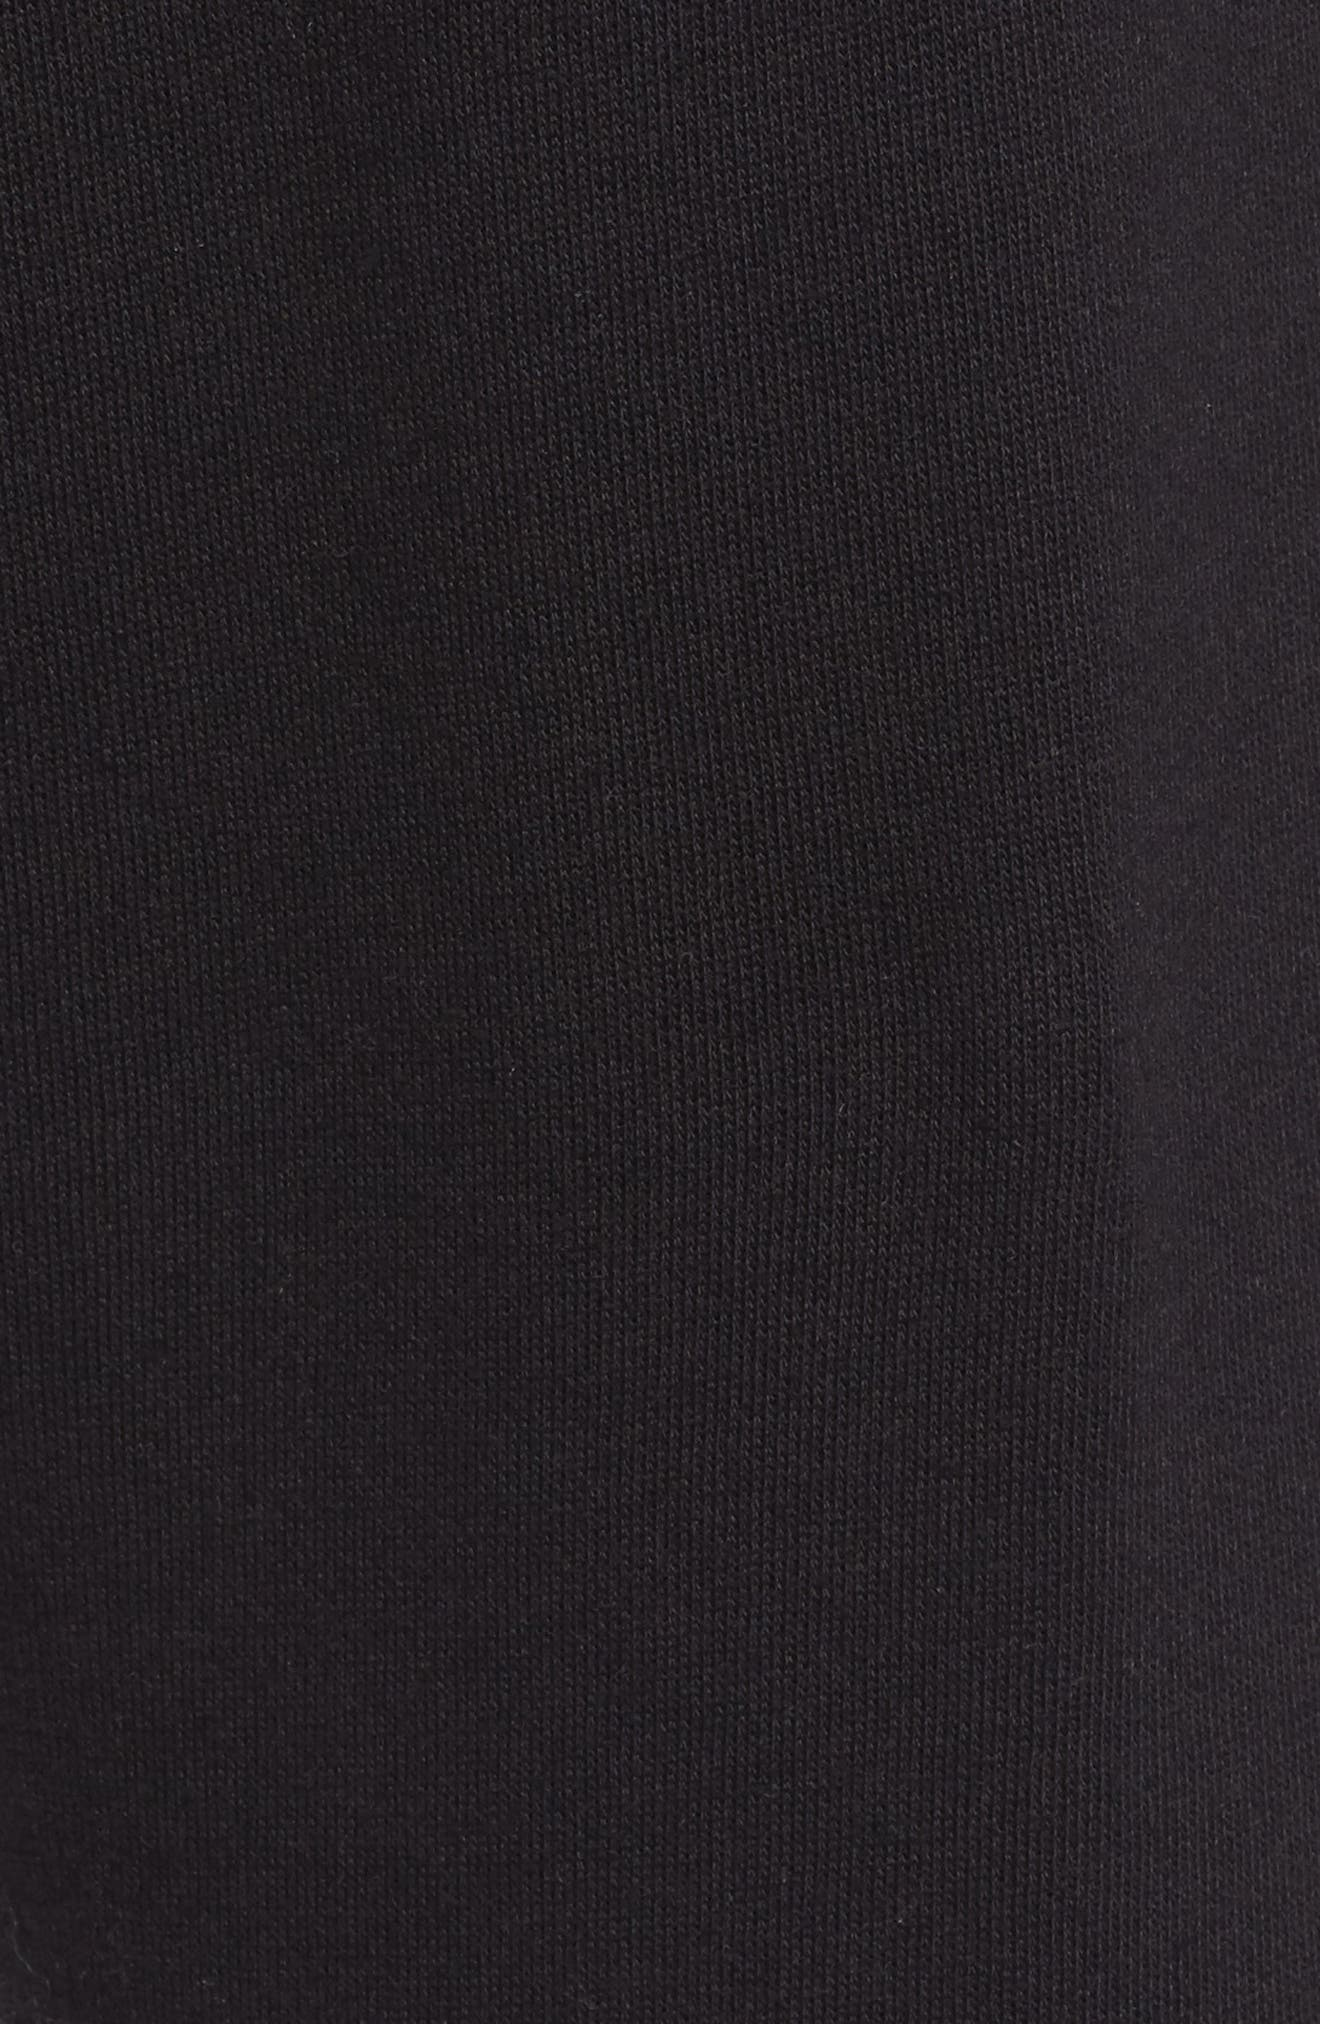 Sweatpants,                             Alternate thumbnail 5, color,                             Black